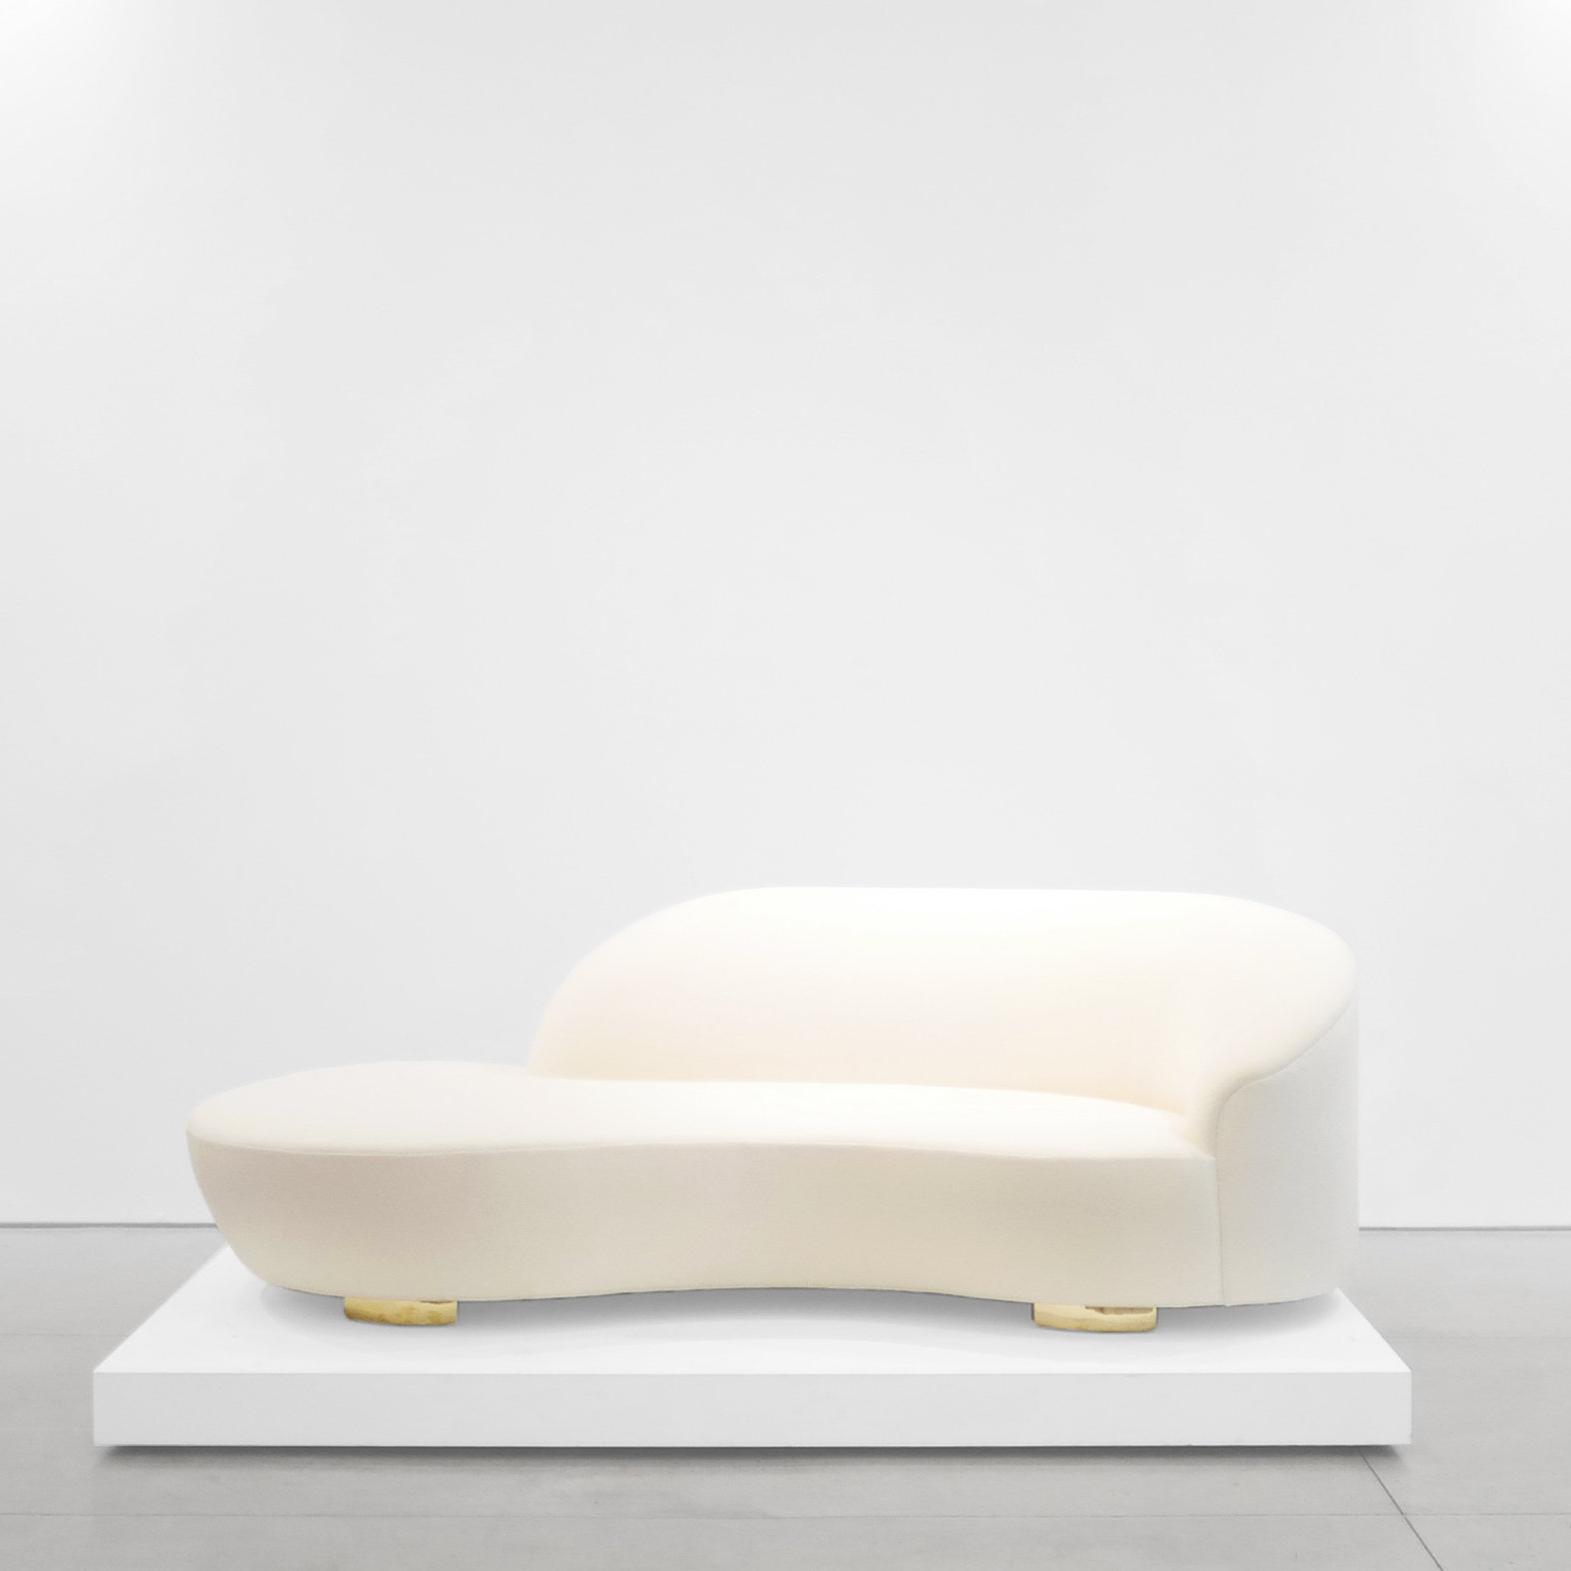 vladimir kagan  'cloud' sofa  c. 1970 - 1979 ...